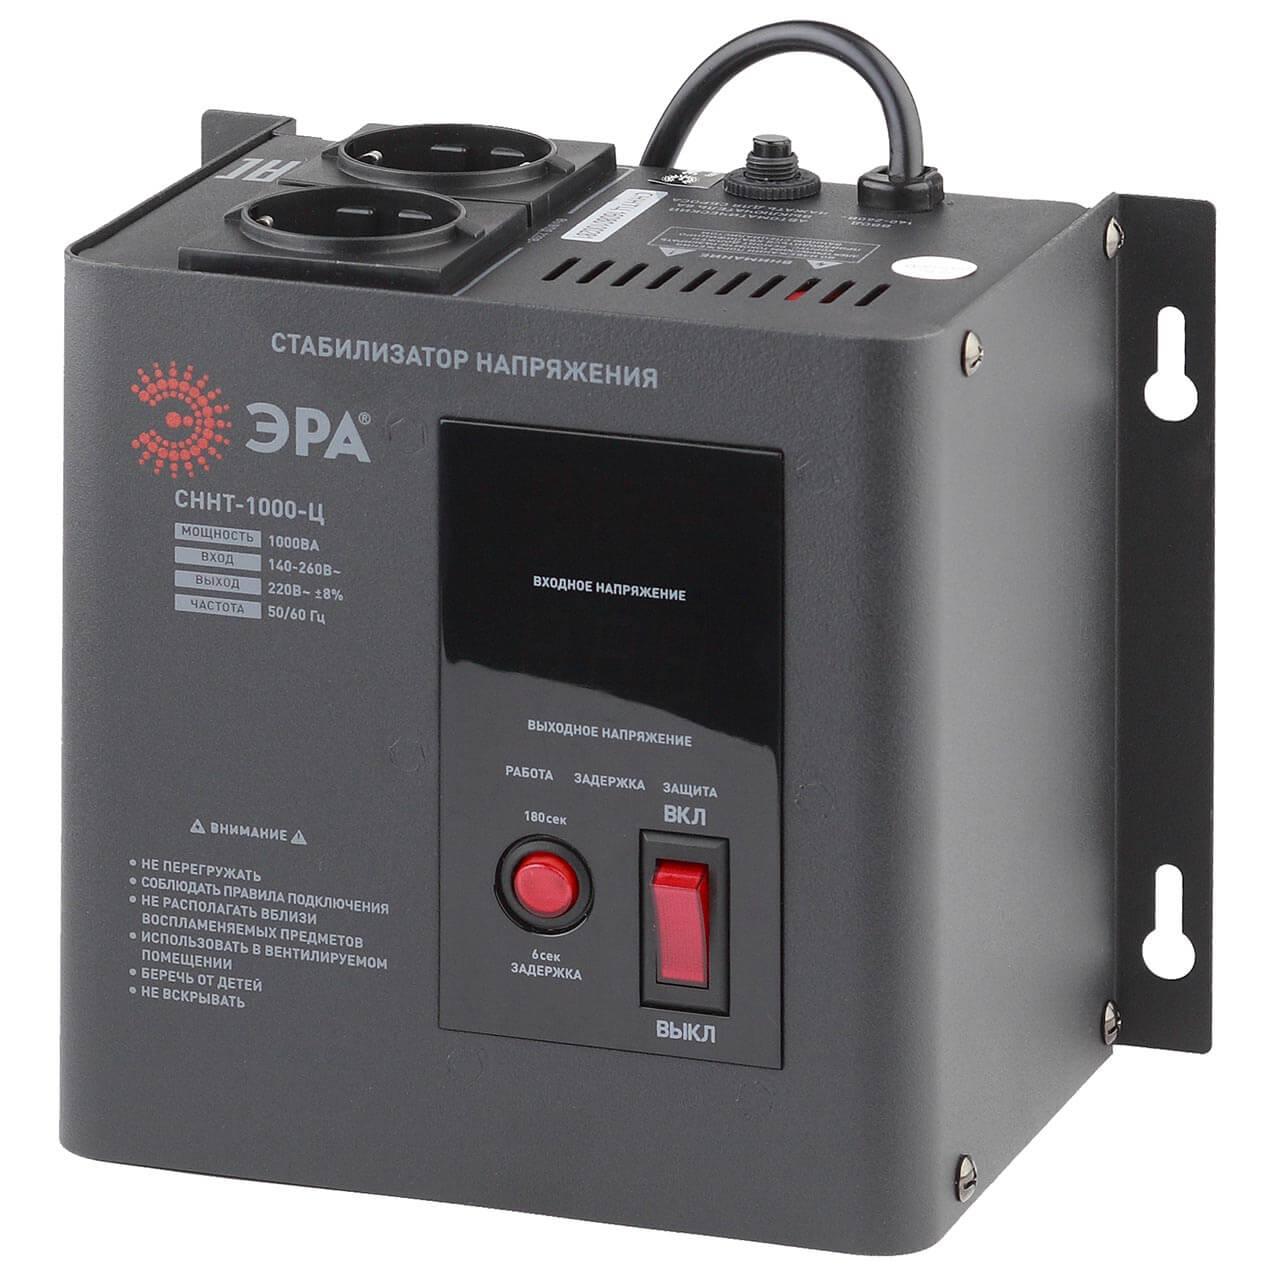 Стабилизатор напряжения ЭРА СННТ-1000-Ц цена